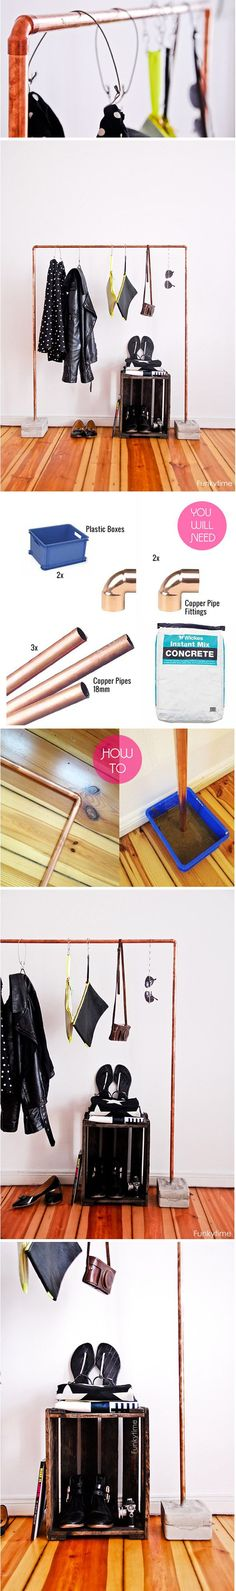 Colgador de ropa con tuberías de cobre  Muy Ingenioso